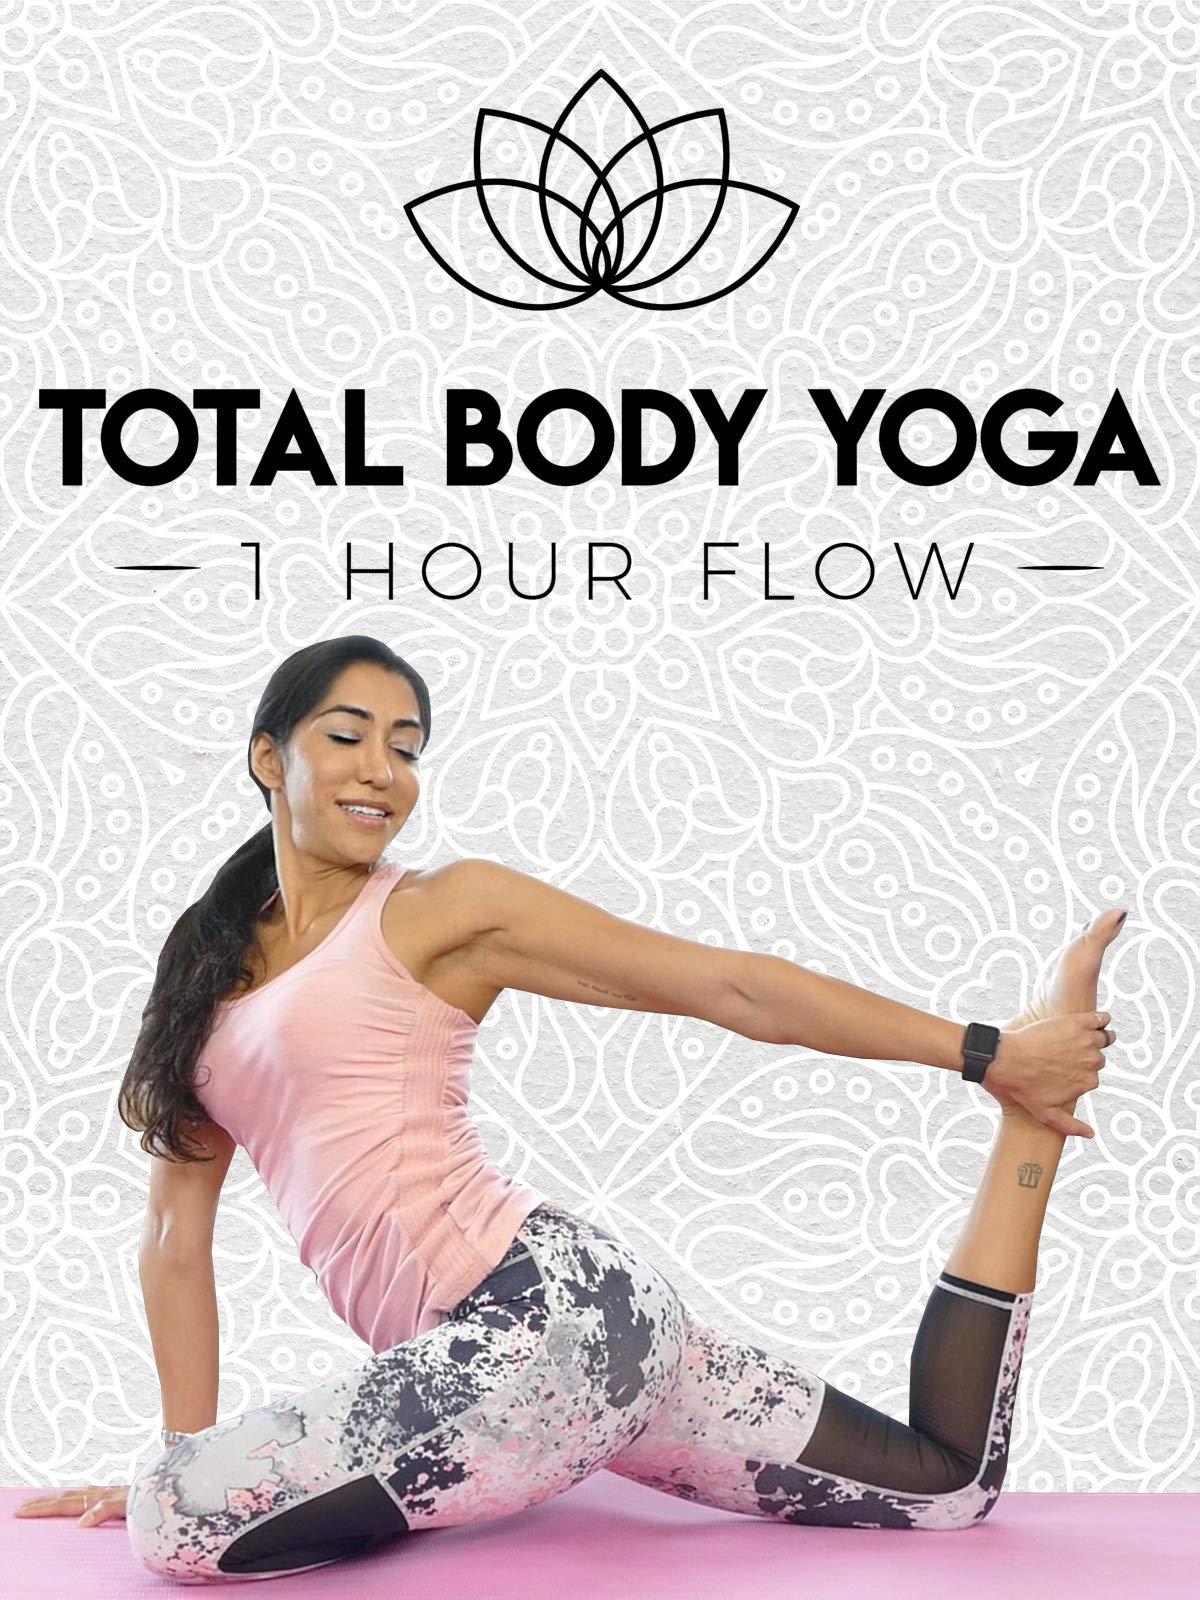 Amazon.com: Watch Total Body Yoga - 1 Hour Flow | Prime Video